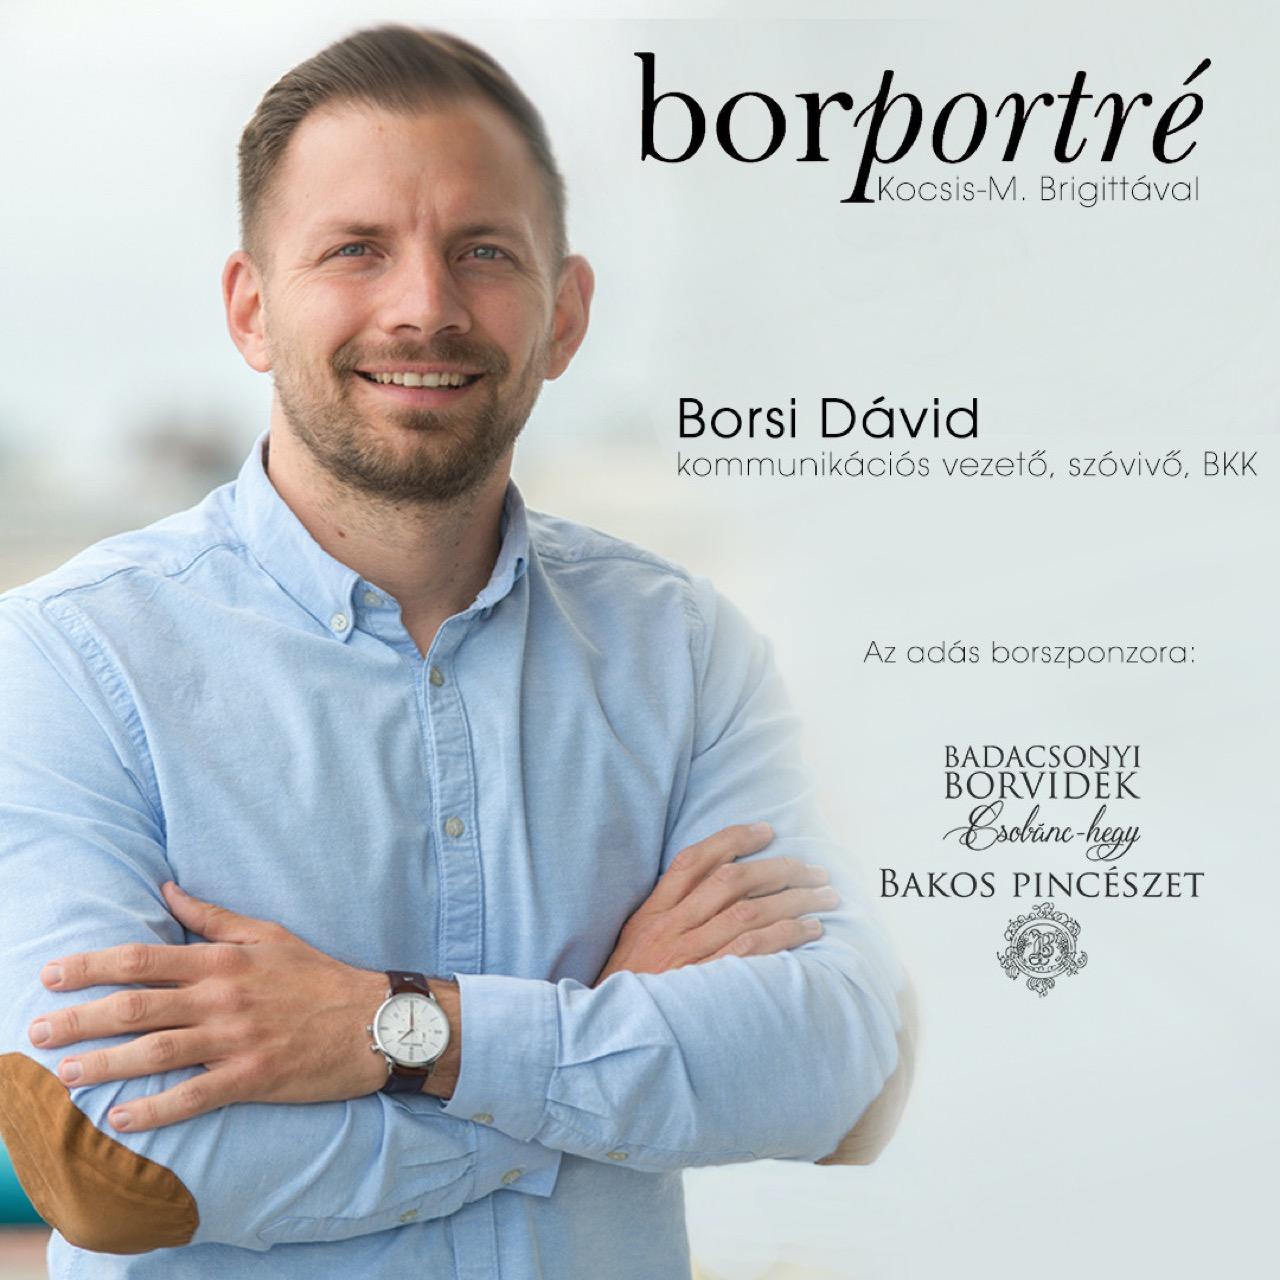 borportre_2021_04_21_borsi_david_bkk_bakos_kocka